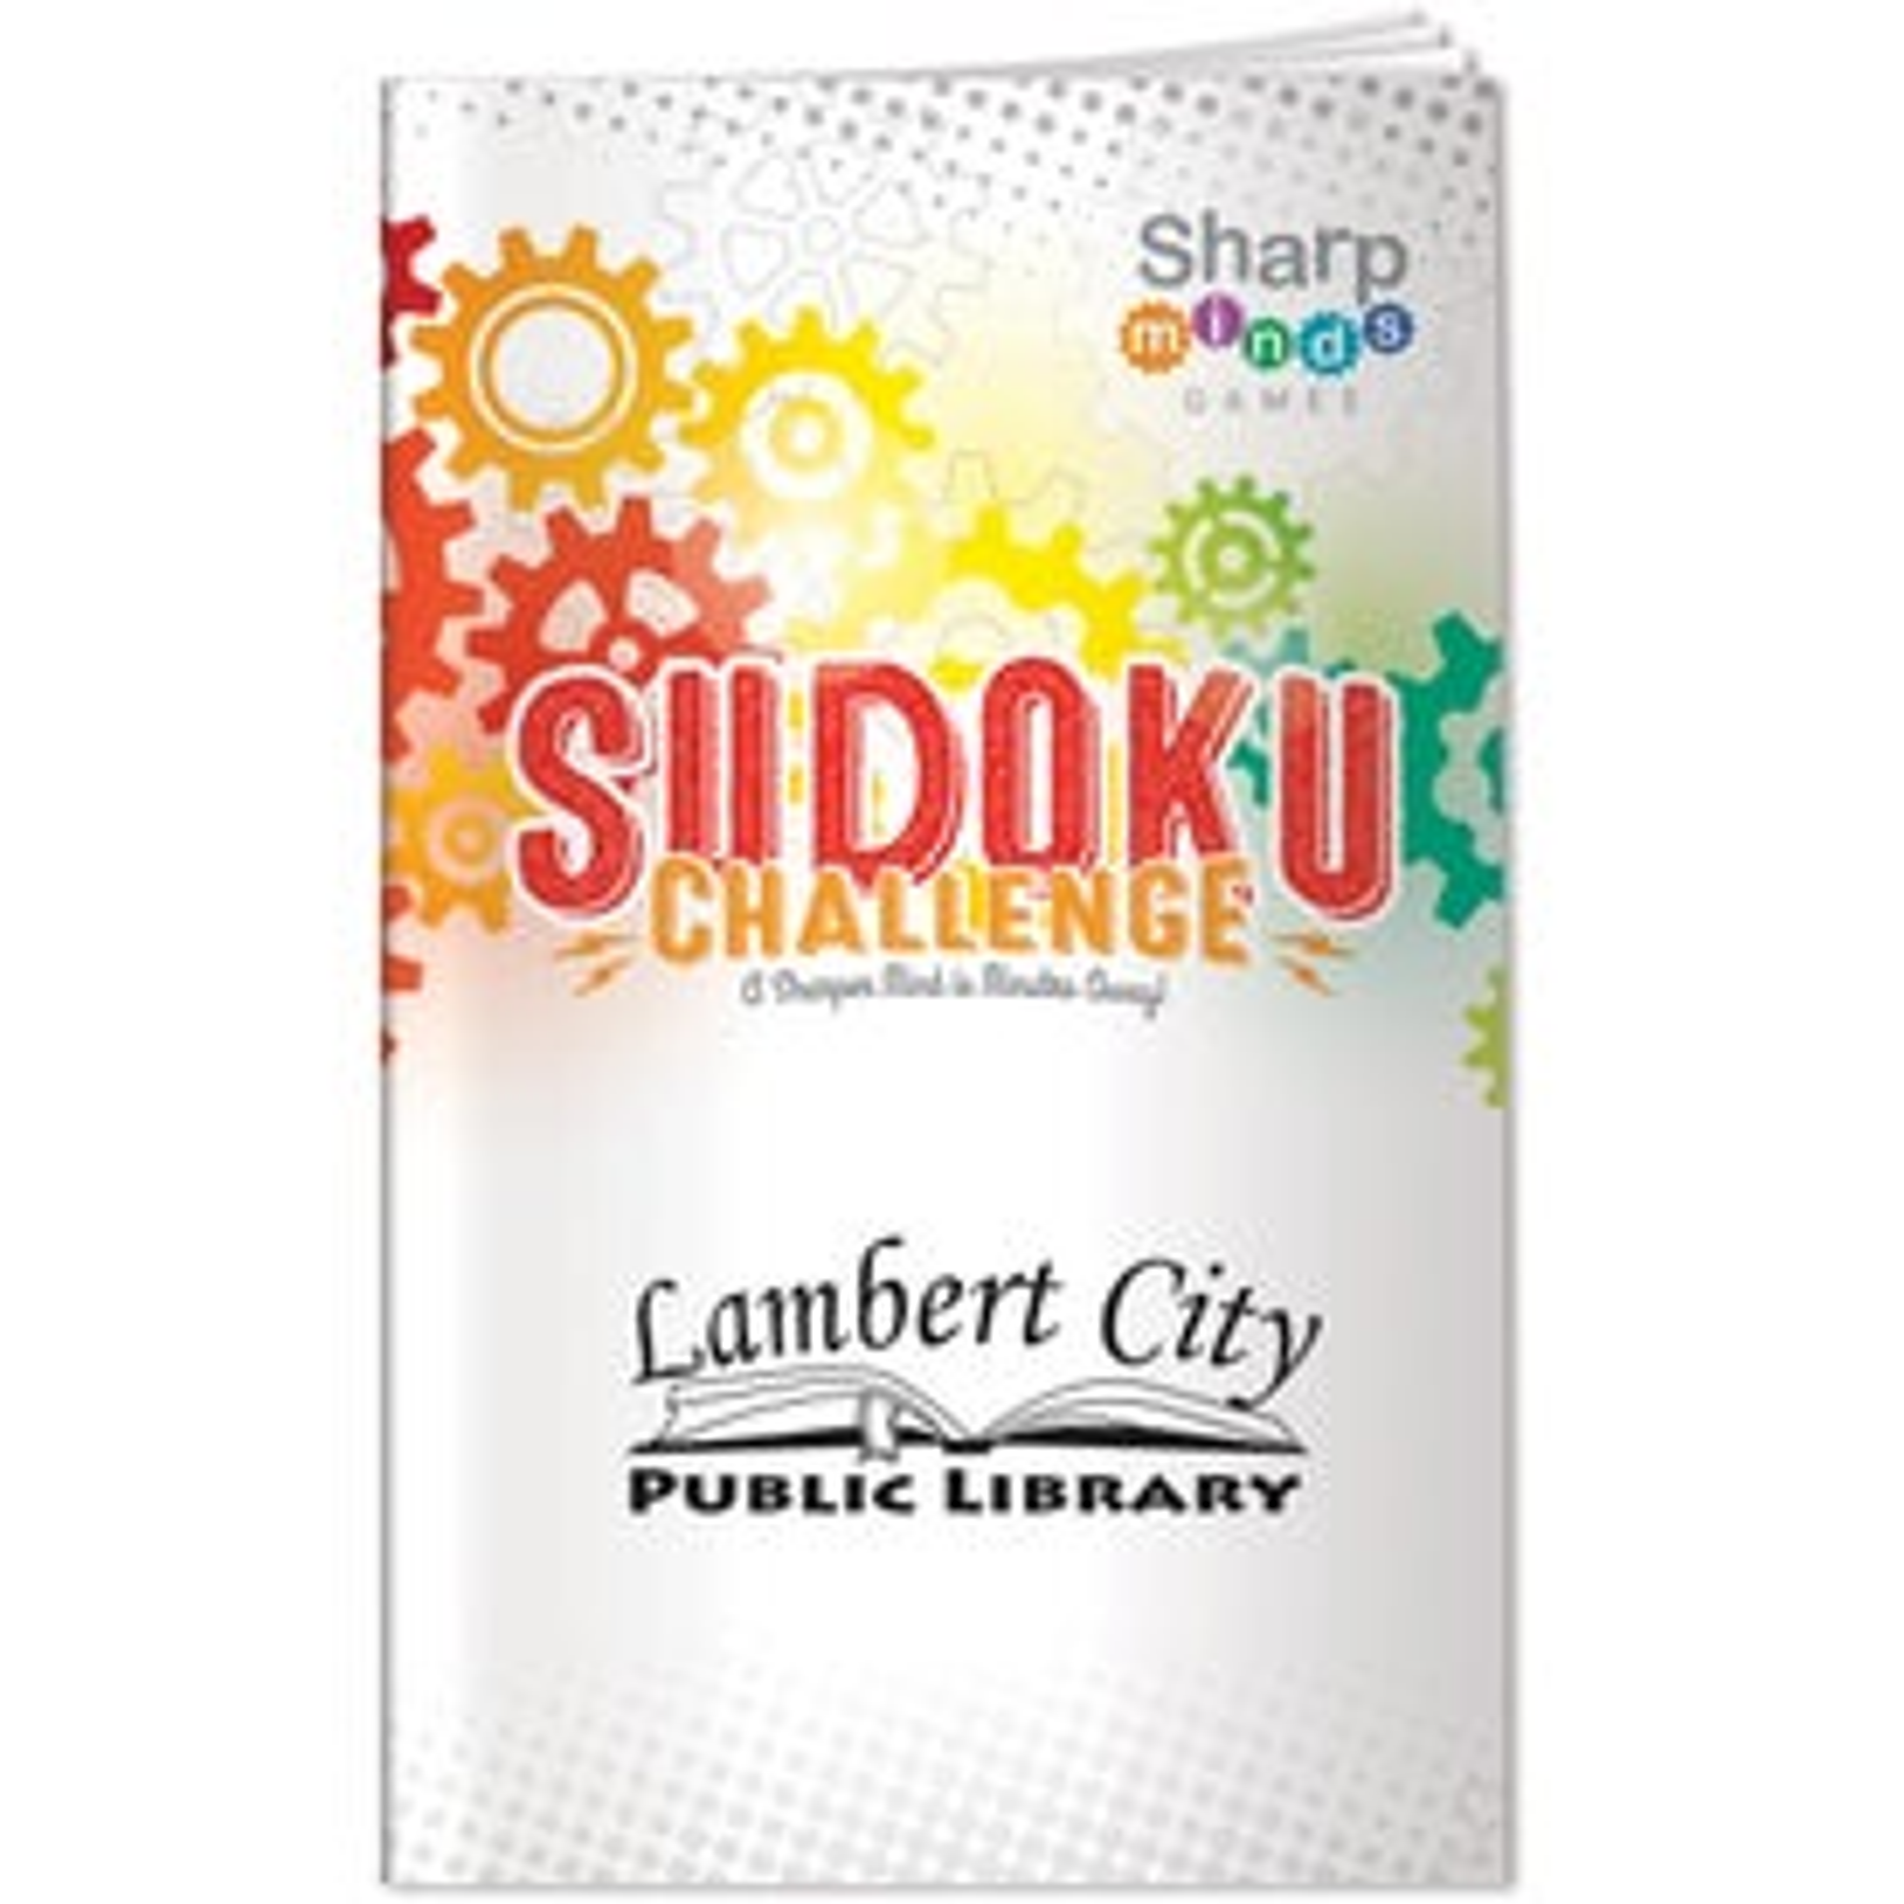 Sharp Minds Games - Sudoku Challenge